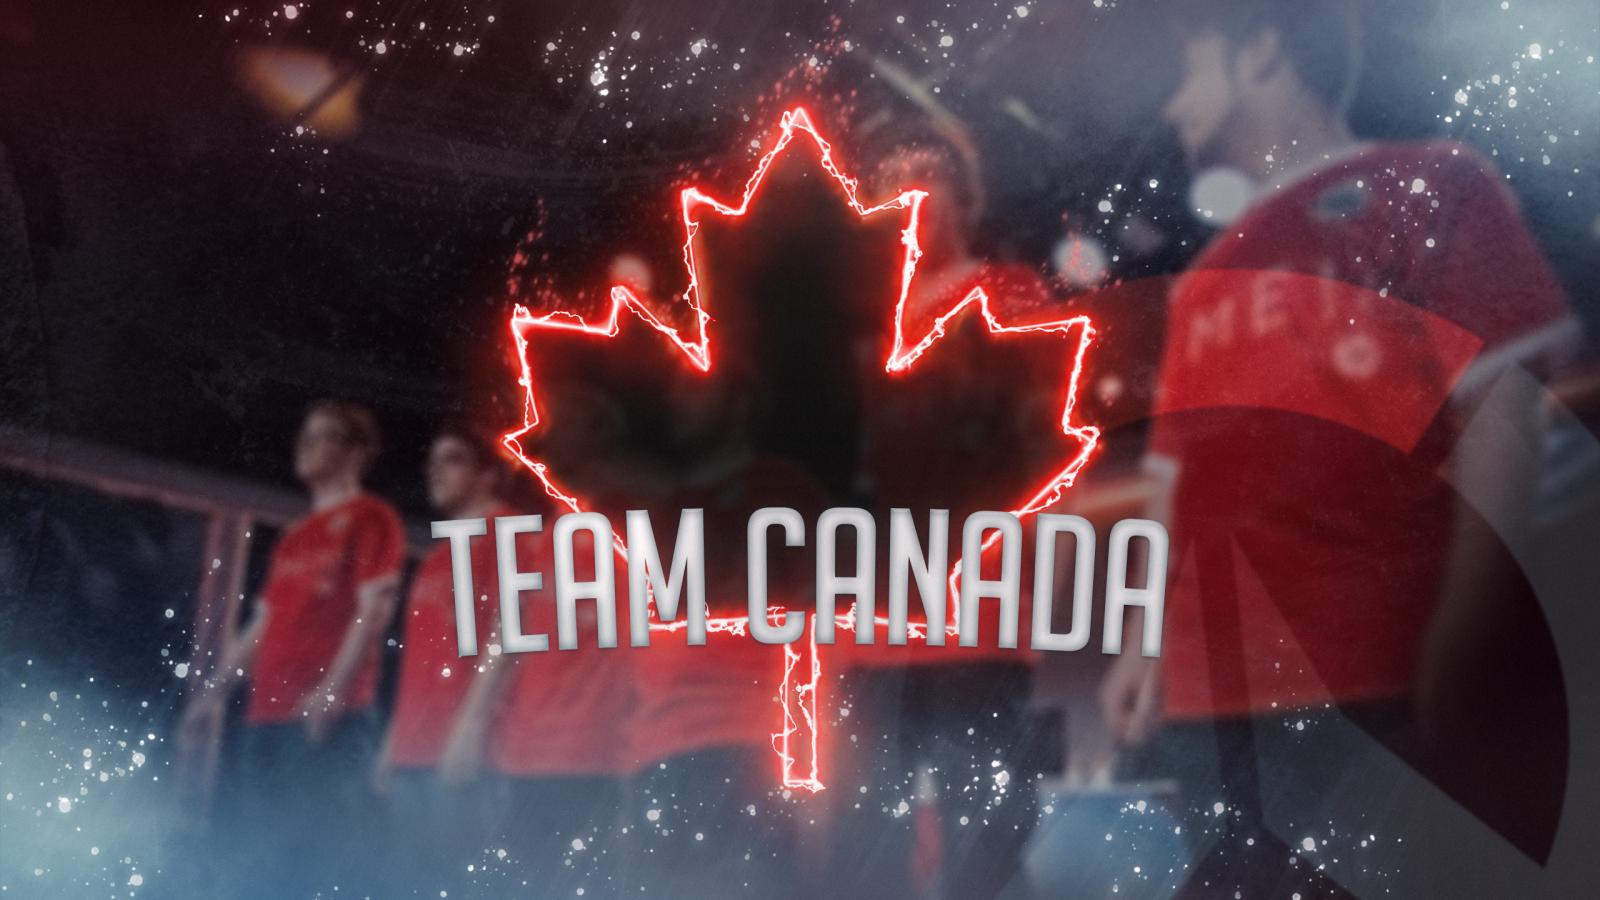 Esport Wallpaper Android: Wallpaper : Overwatch, Team Canada, OWWC, Esport 2560x1440